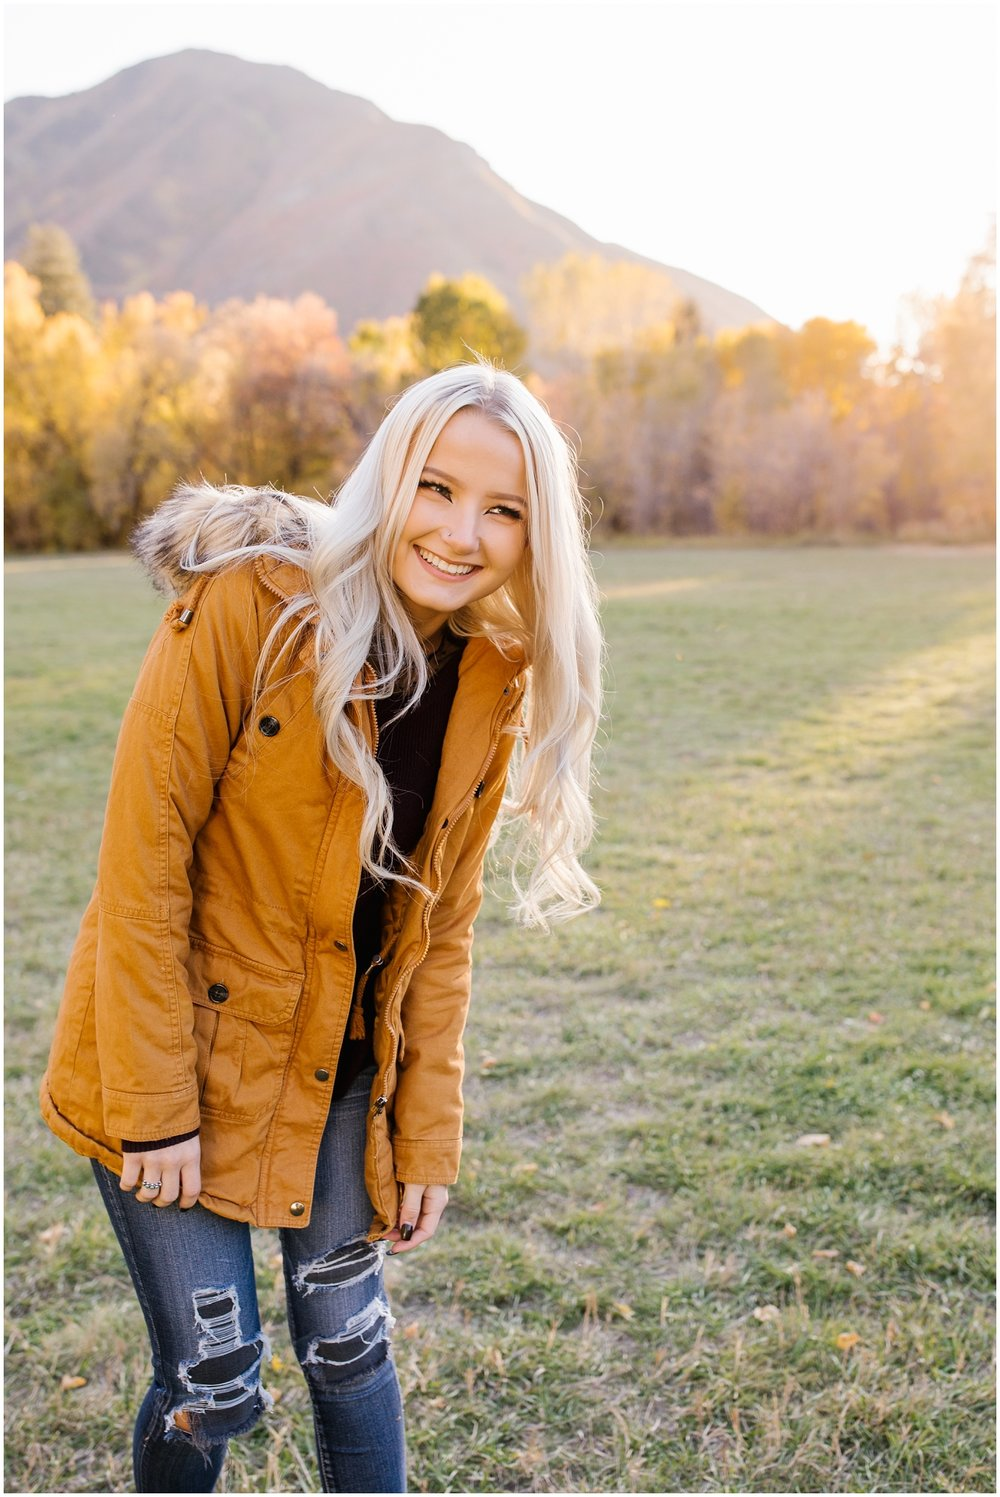 Nielsen--86_Lizzie-B-Imagery-Utah-Family-Photographer-Park-City-Salt-Lake-City-Hobble-Creek-Canyon-Jolleys-Ranch.jpg